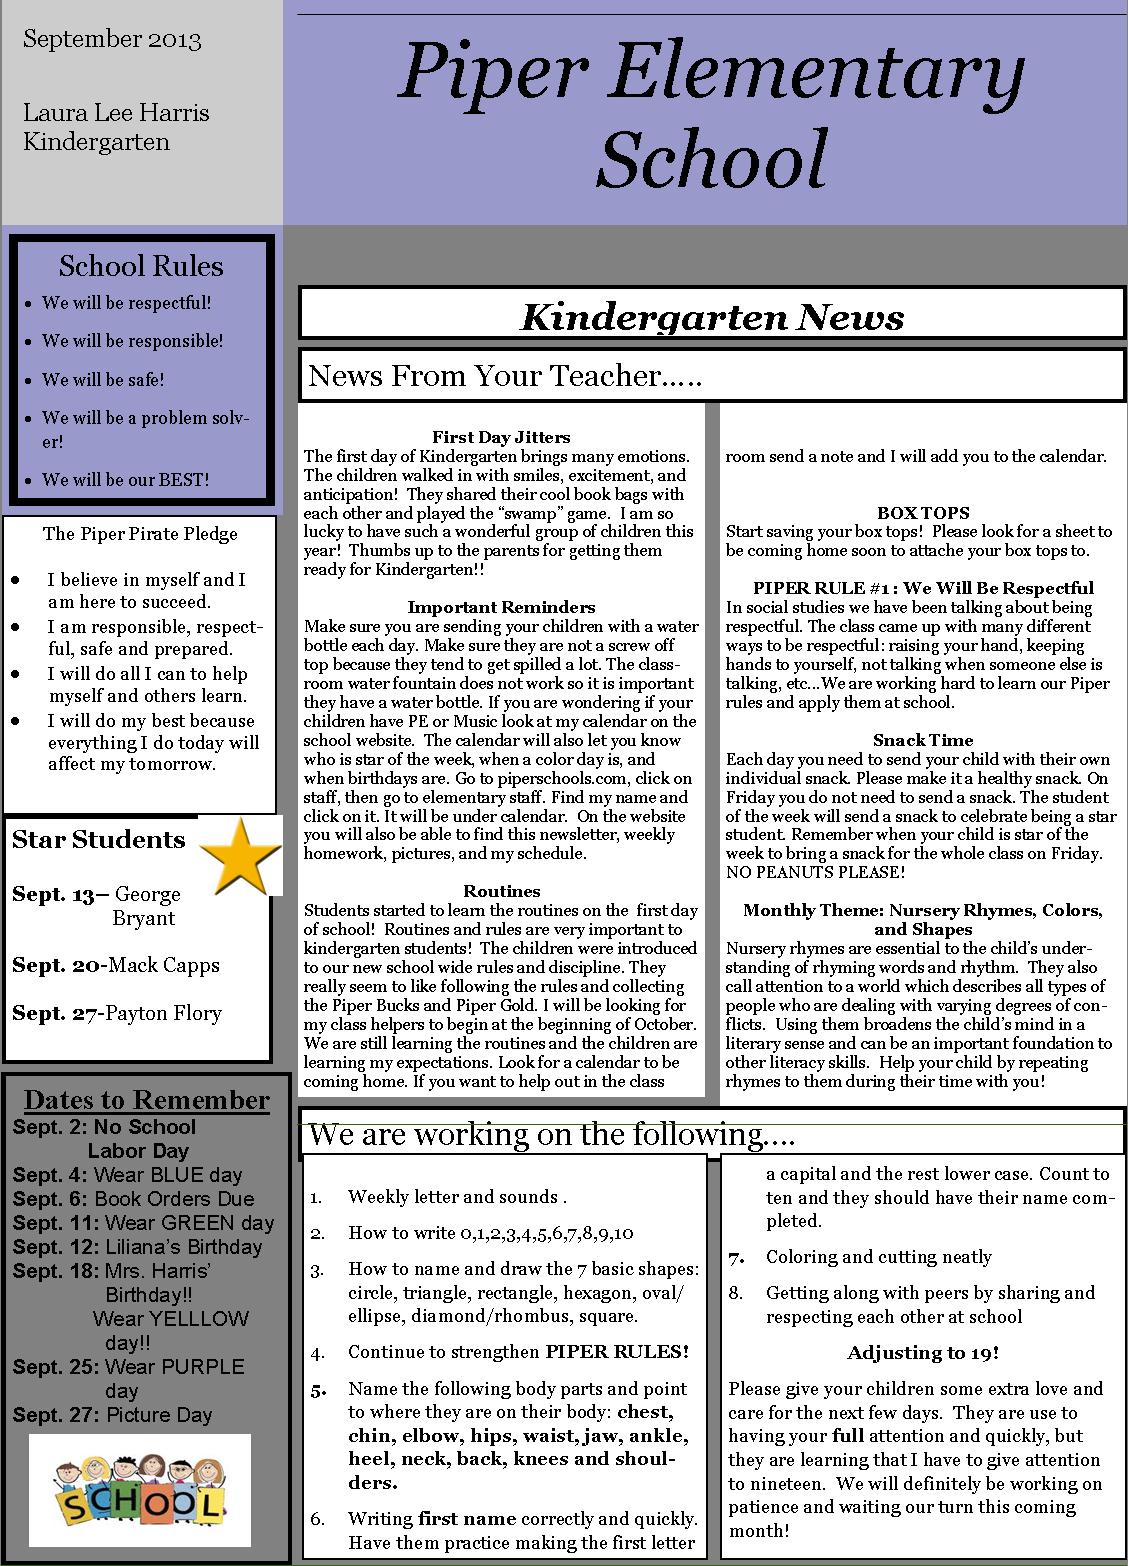 elementary school newsletter cake ideas and designs. Black Bedroom Furniture Sets. Home Design Ideas